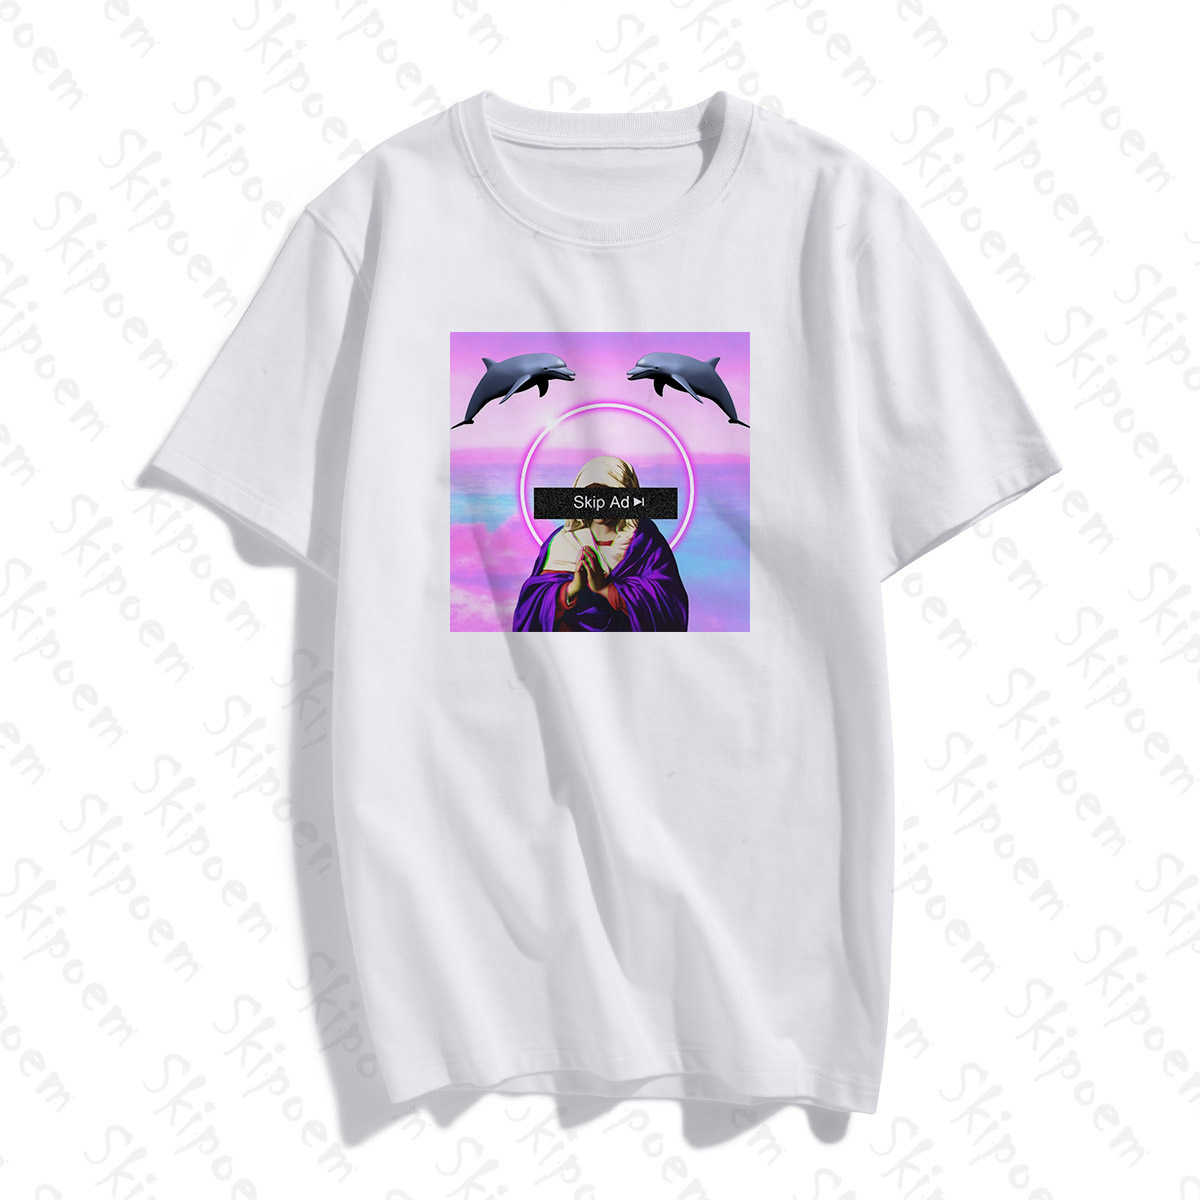 Funny Creative Retro Style T Shirt Women Tumblr Harajuku Kawaii Aesthetic Cotton Plus Size Short Sleeve Clothes Tee Shirt Femme